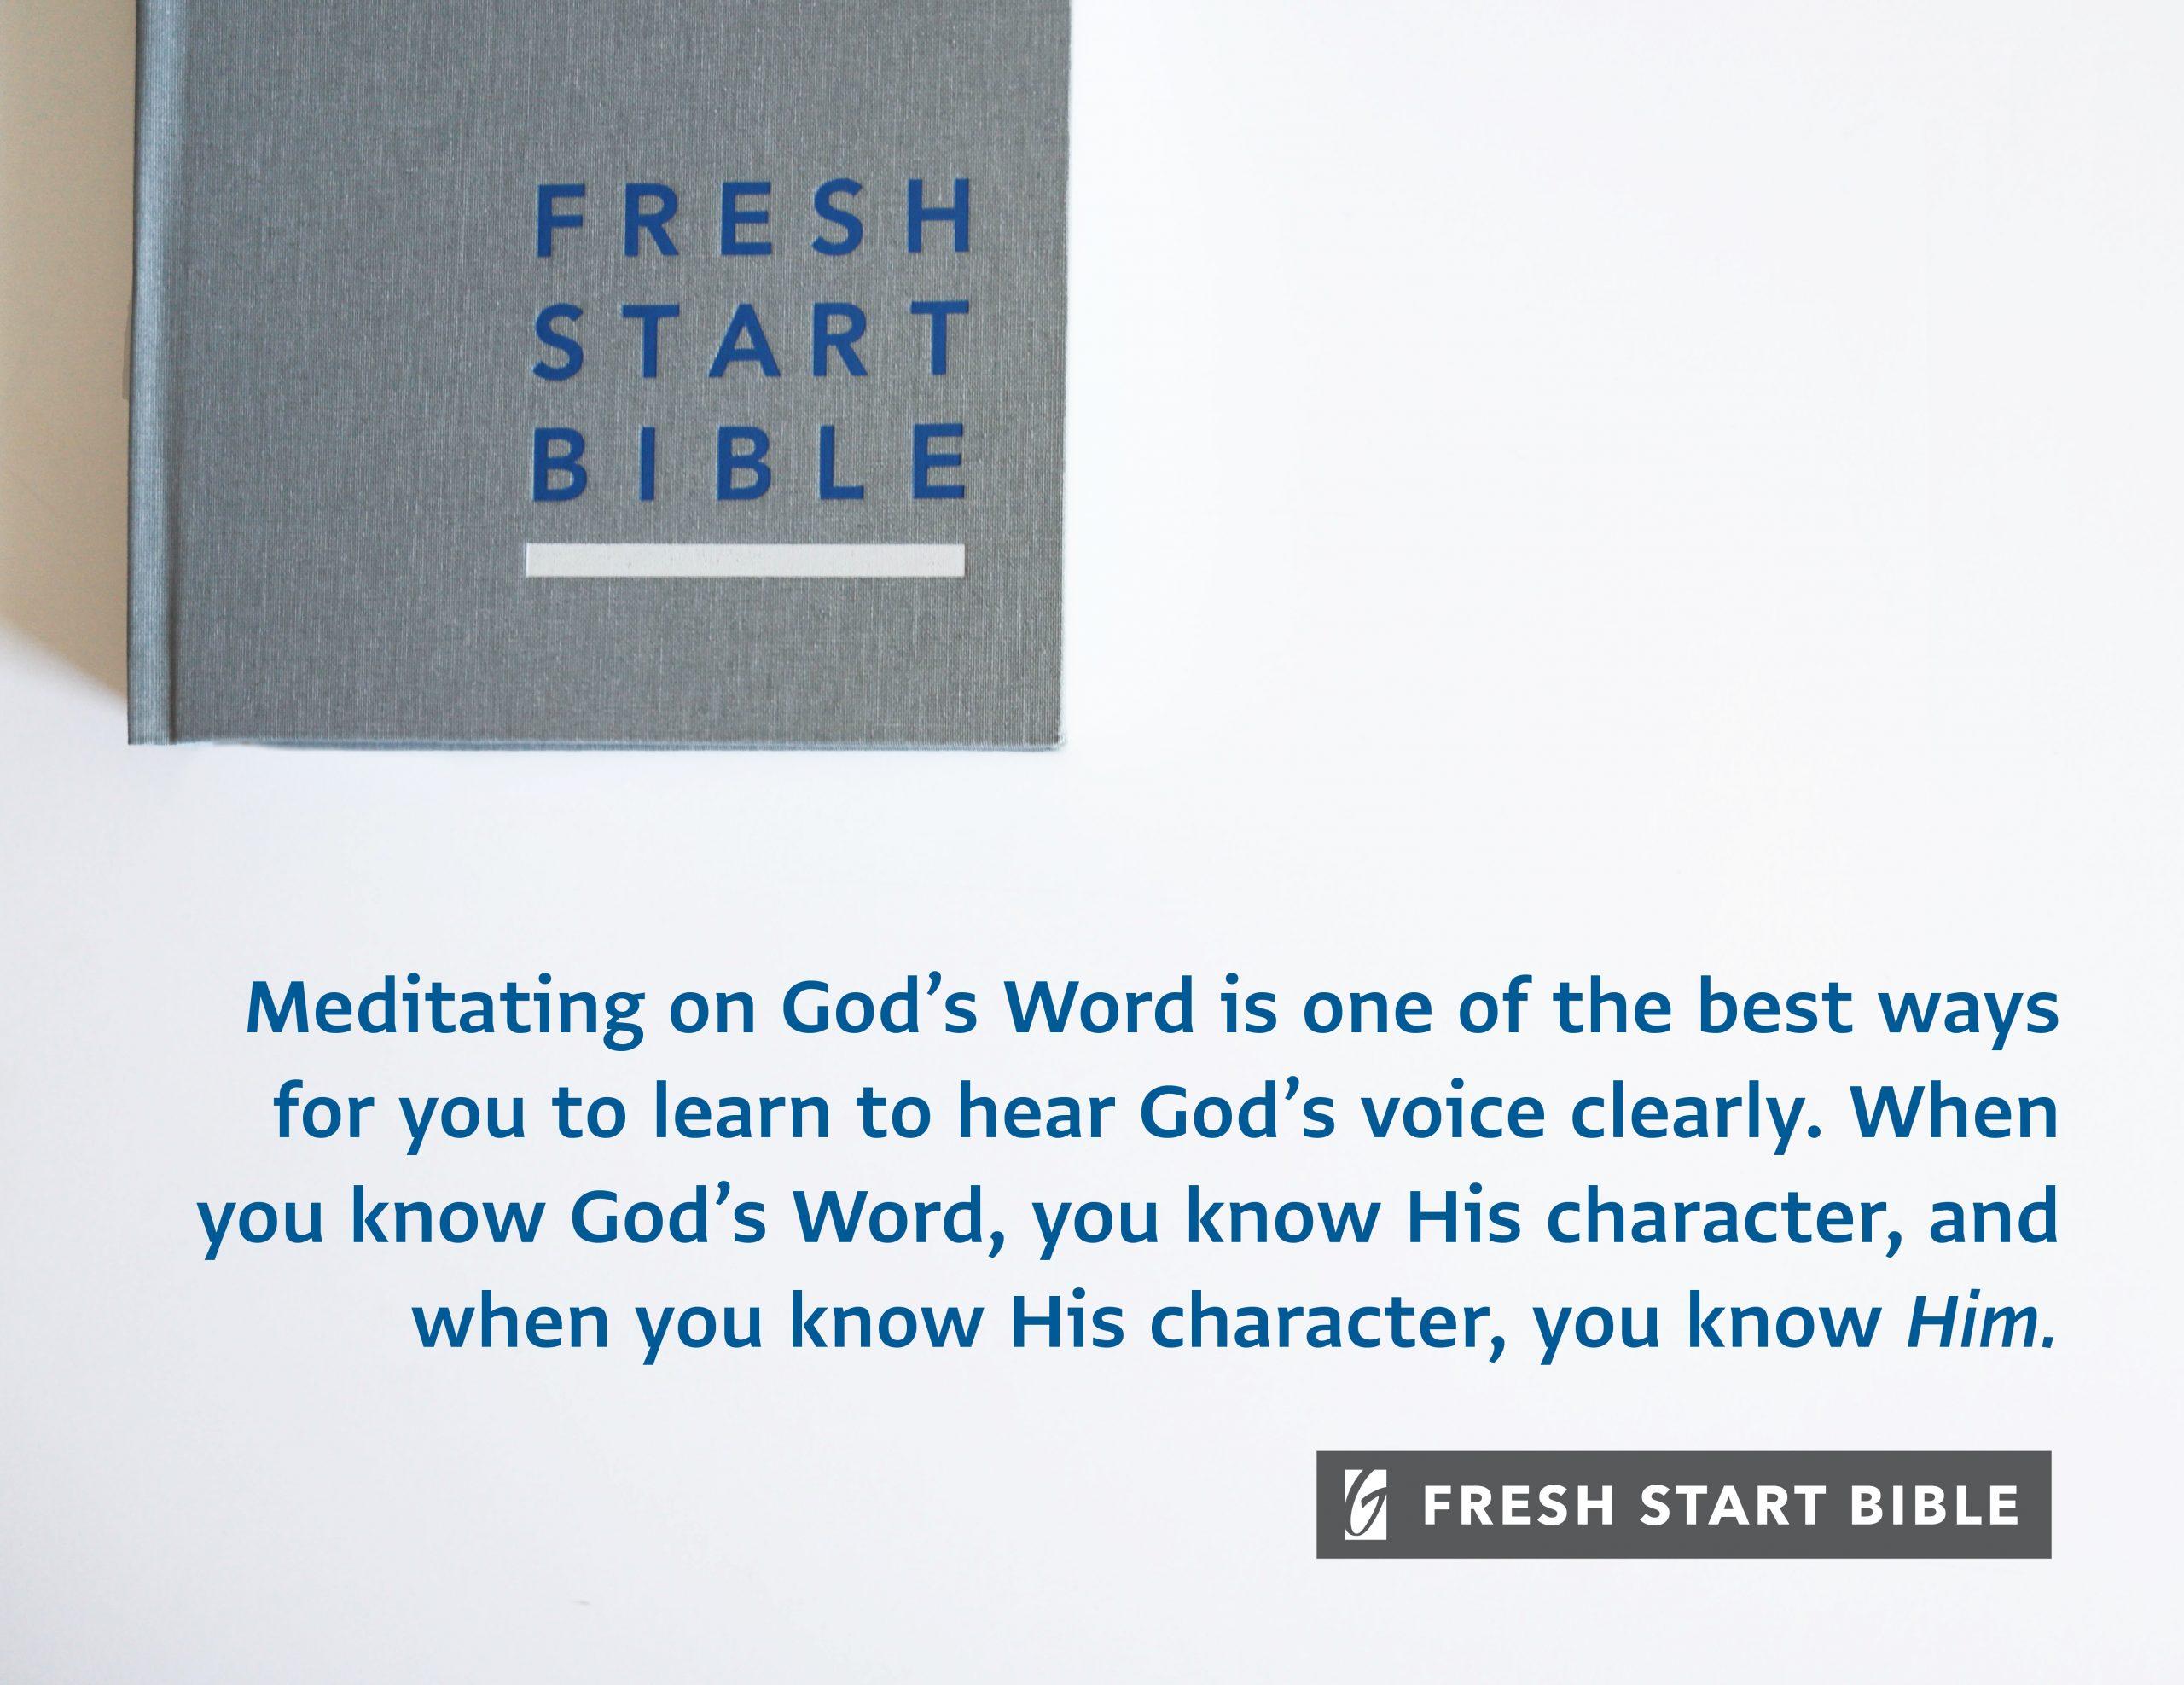 Fresh Start Bible